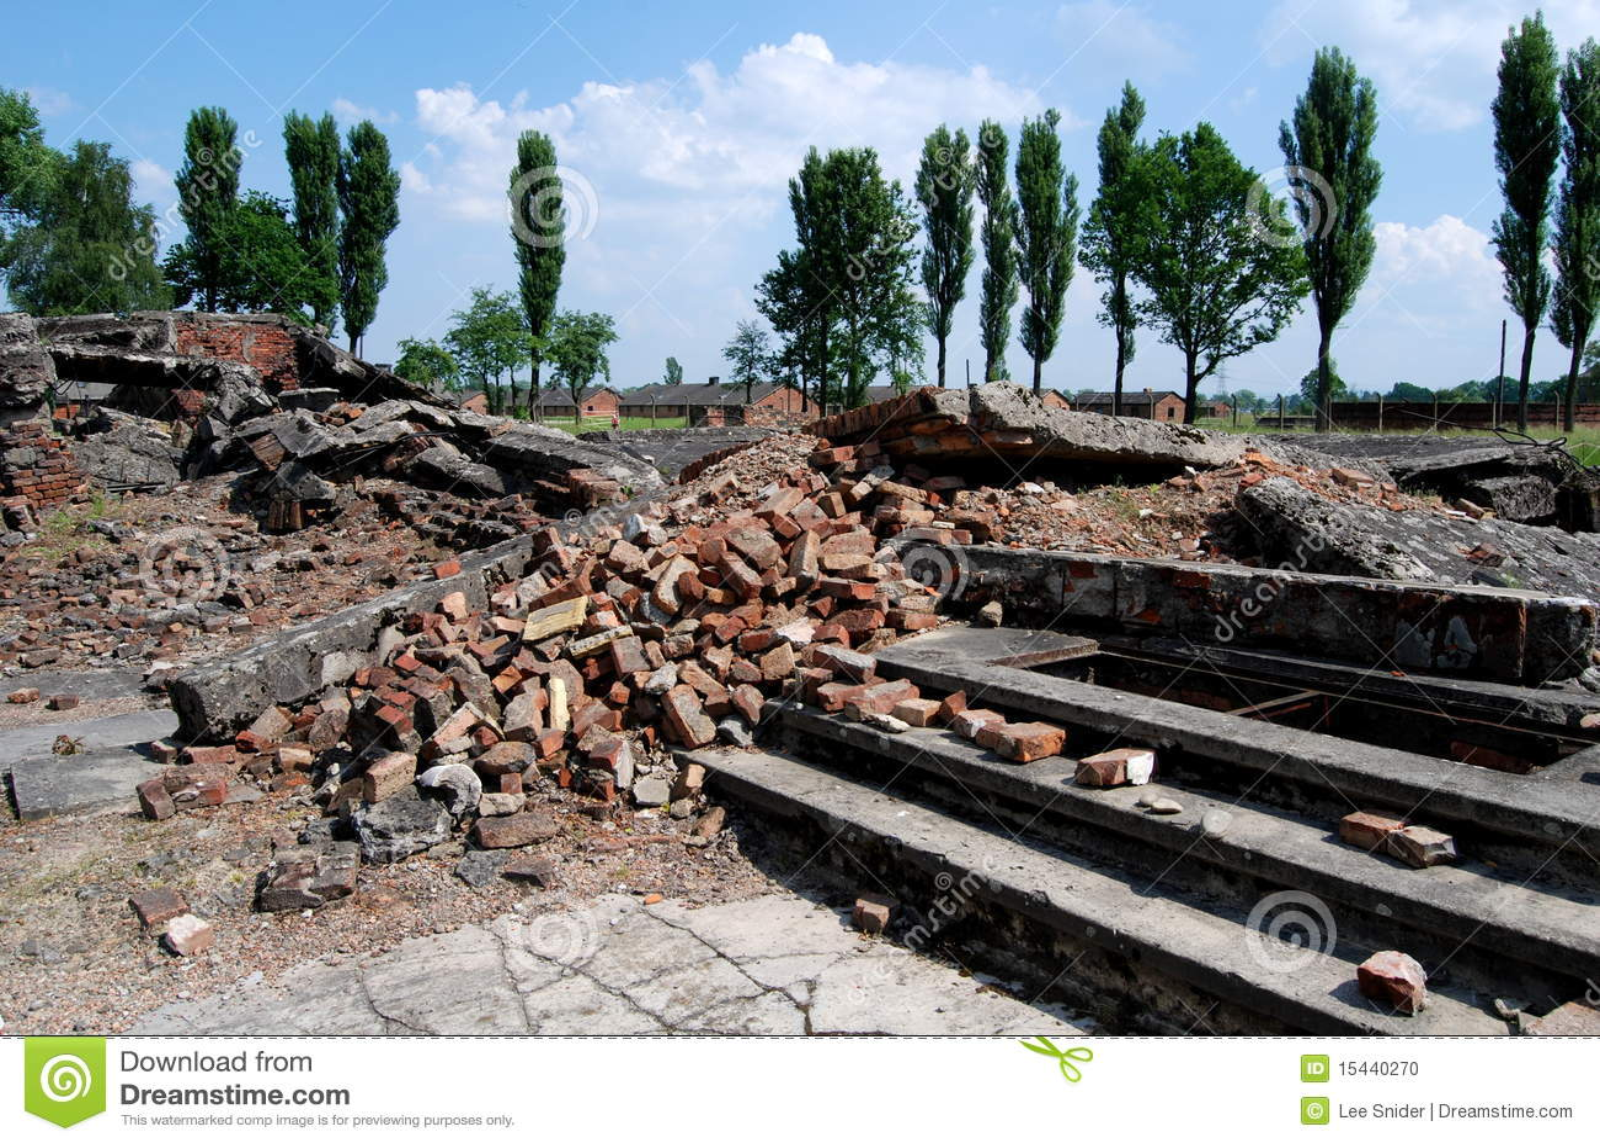 Auschwitz pologne ruines de chambre gaz image ditorial for Auschwitz chambre a gaz